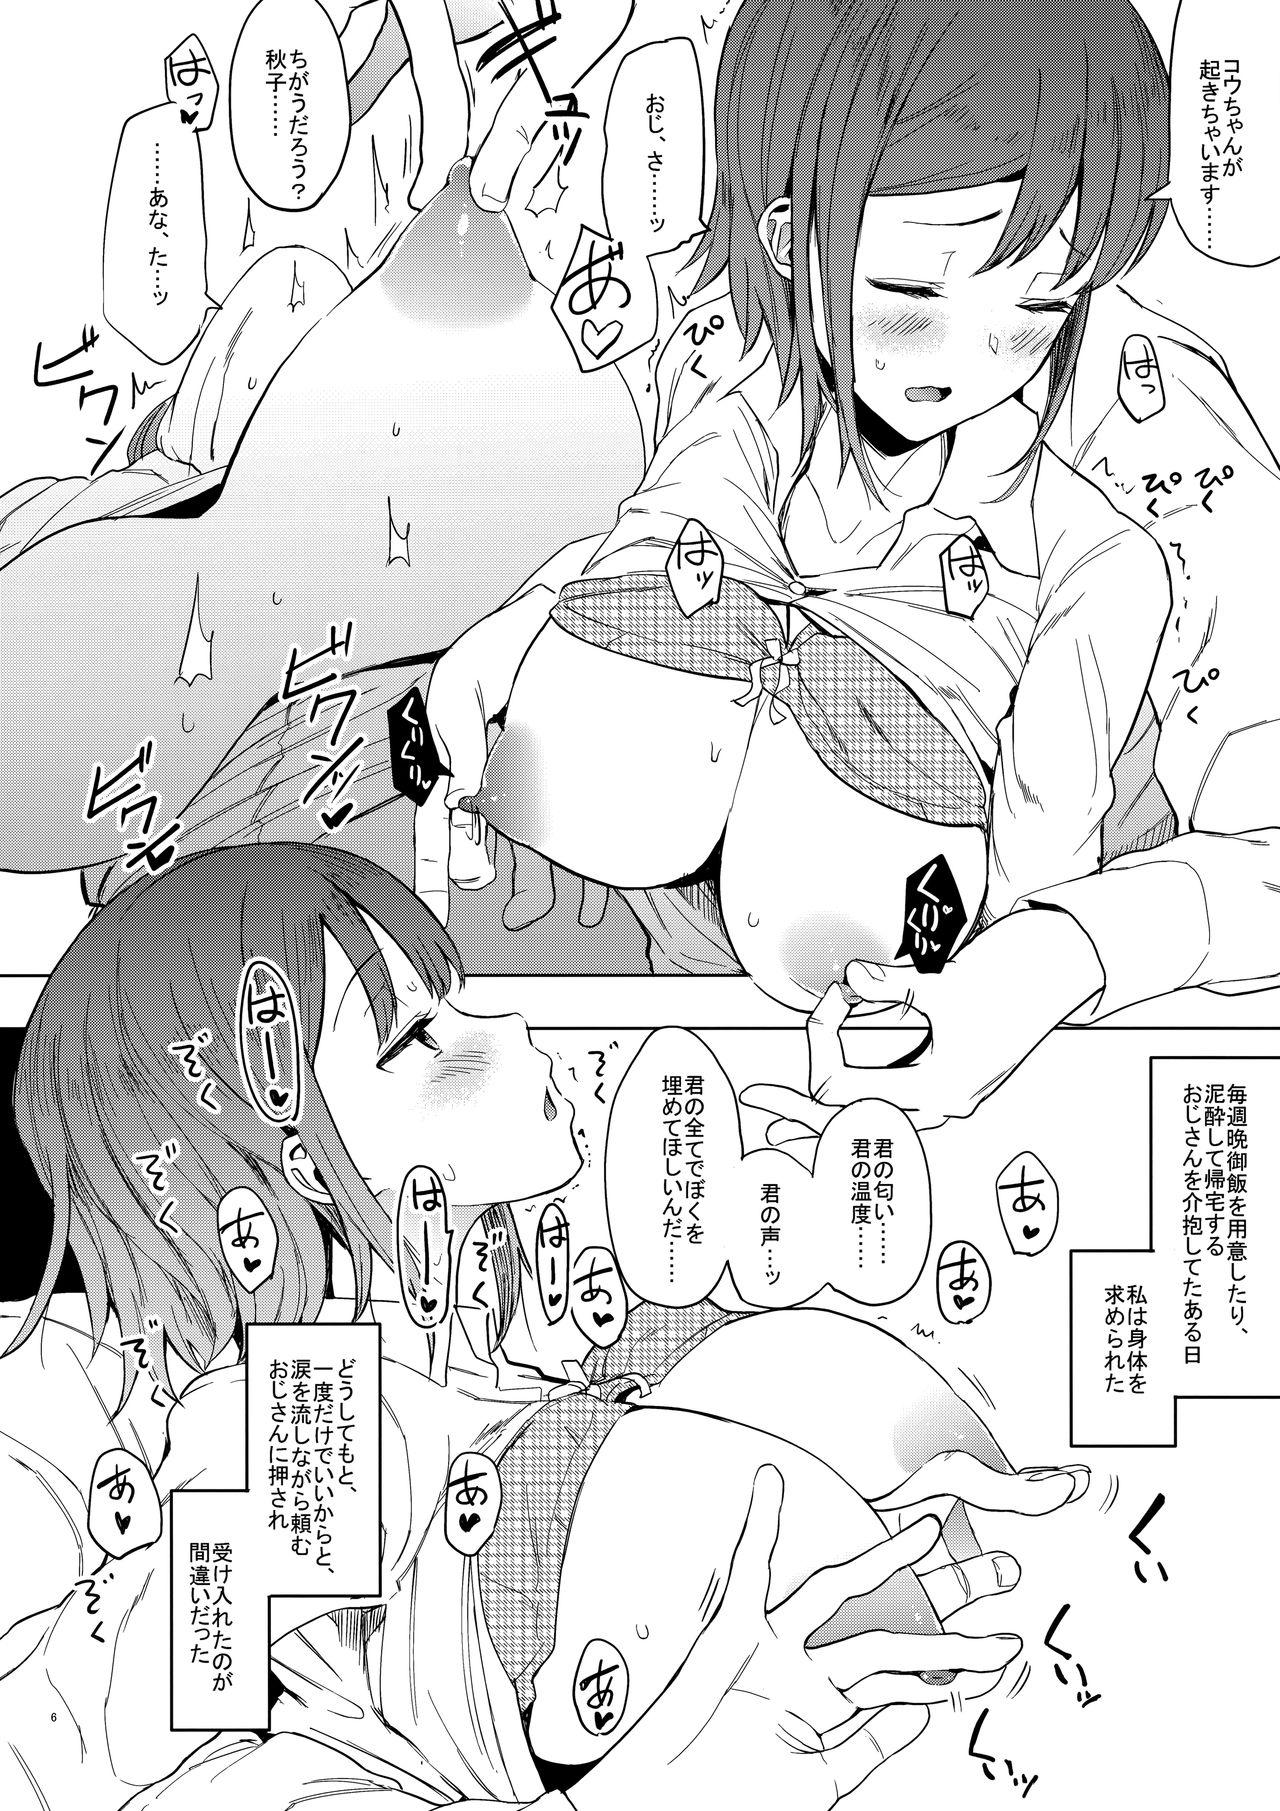 Yuzu-nee 6